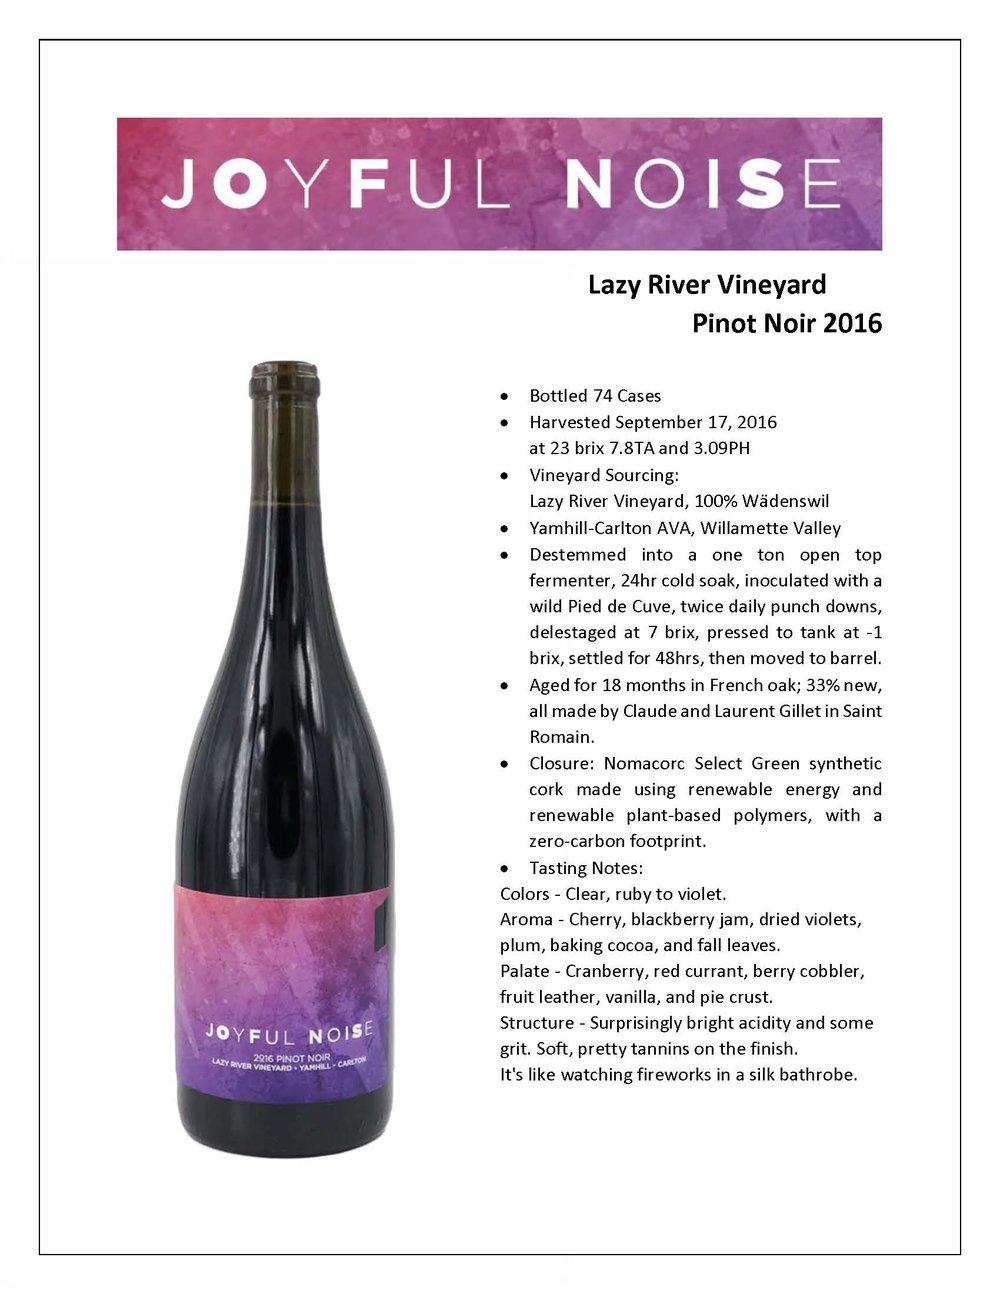 Joyful Noise Lazy River Vineyard PN 2016 Tech Sheet.jpg